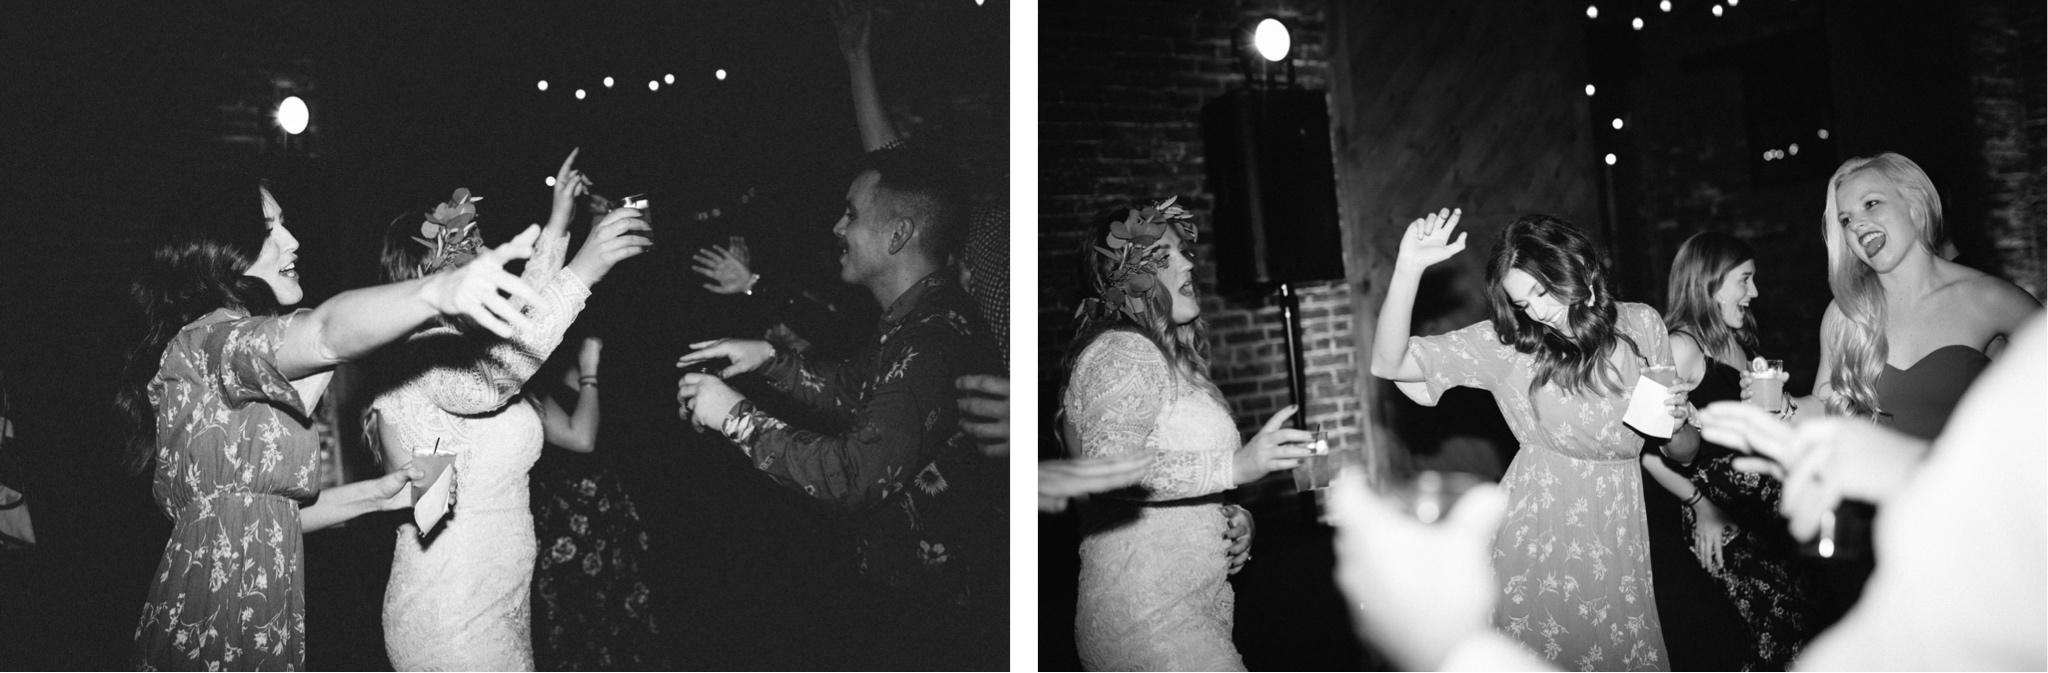 53_19-03-30 Caylen and Max Wedding Previews-107_19-03-30 Caylen and Max Wedding Previews-106.jpg